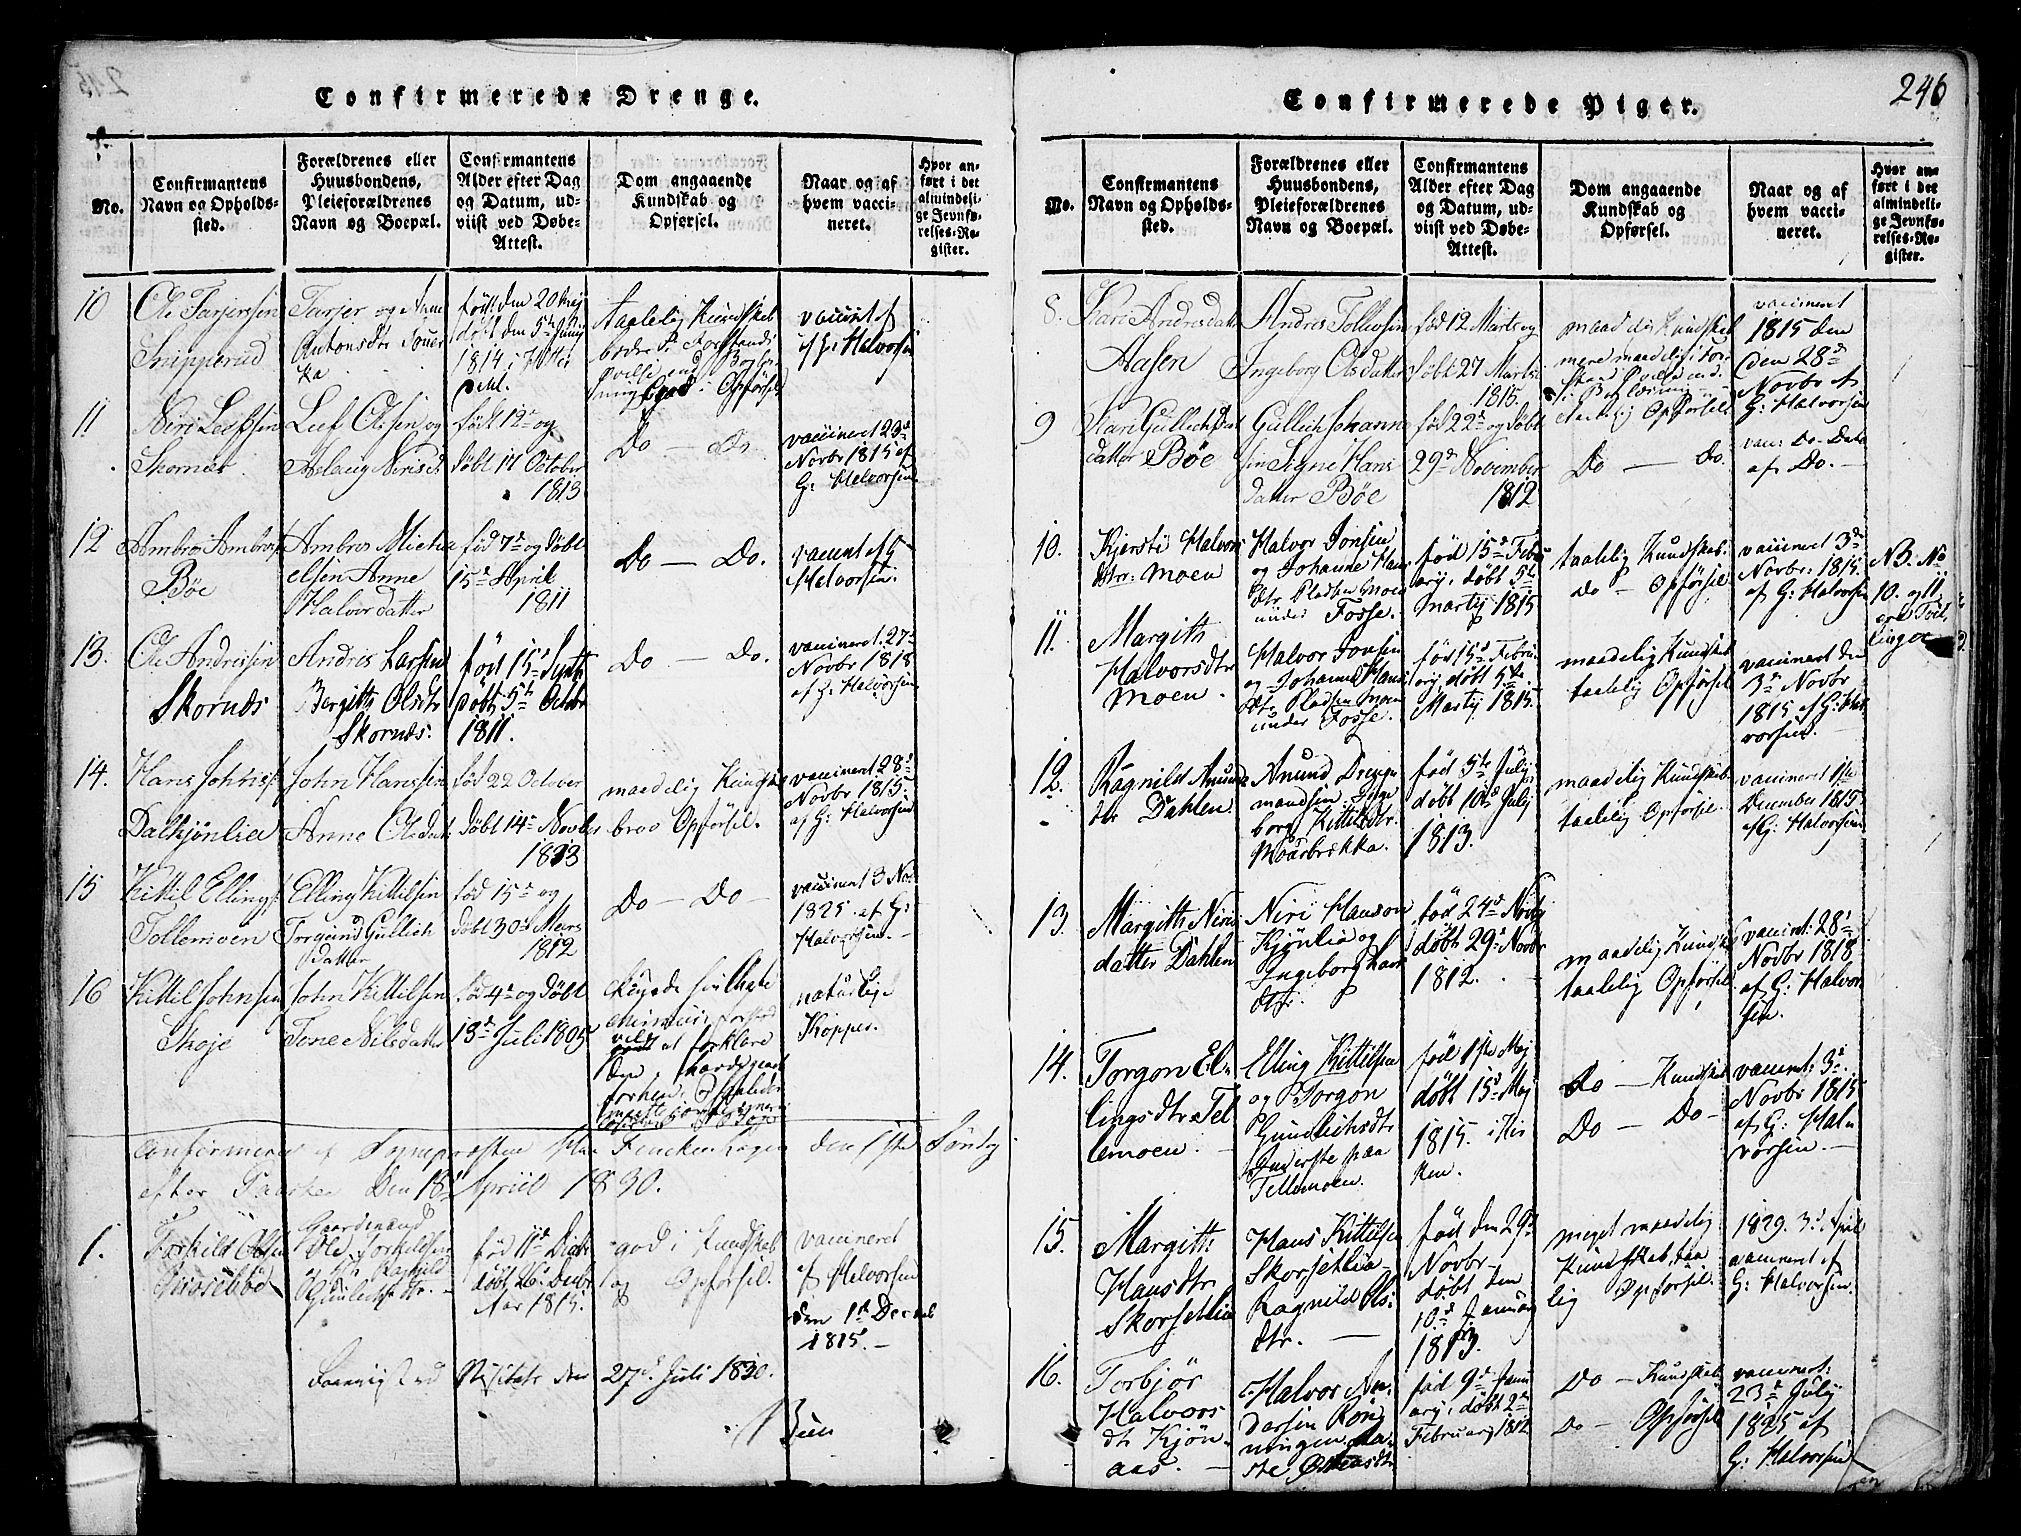 SAKO, Hjartdal kirkebøker, F/Fb/L0001: Ministerialbok nr. II 1, 1815-1843, s. 246